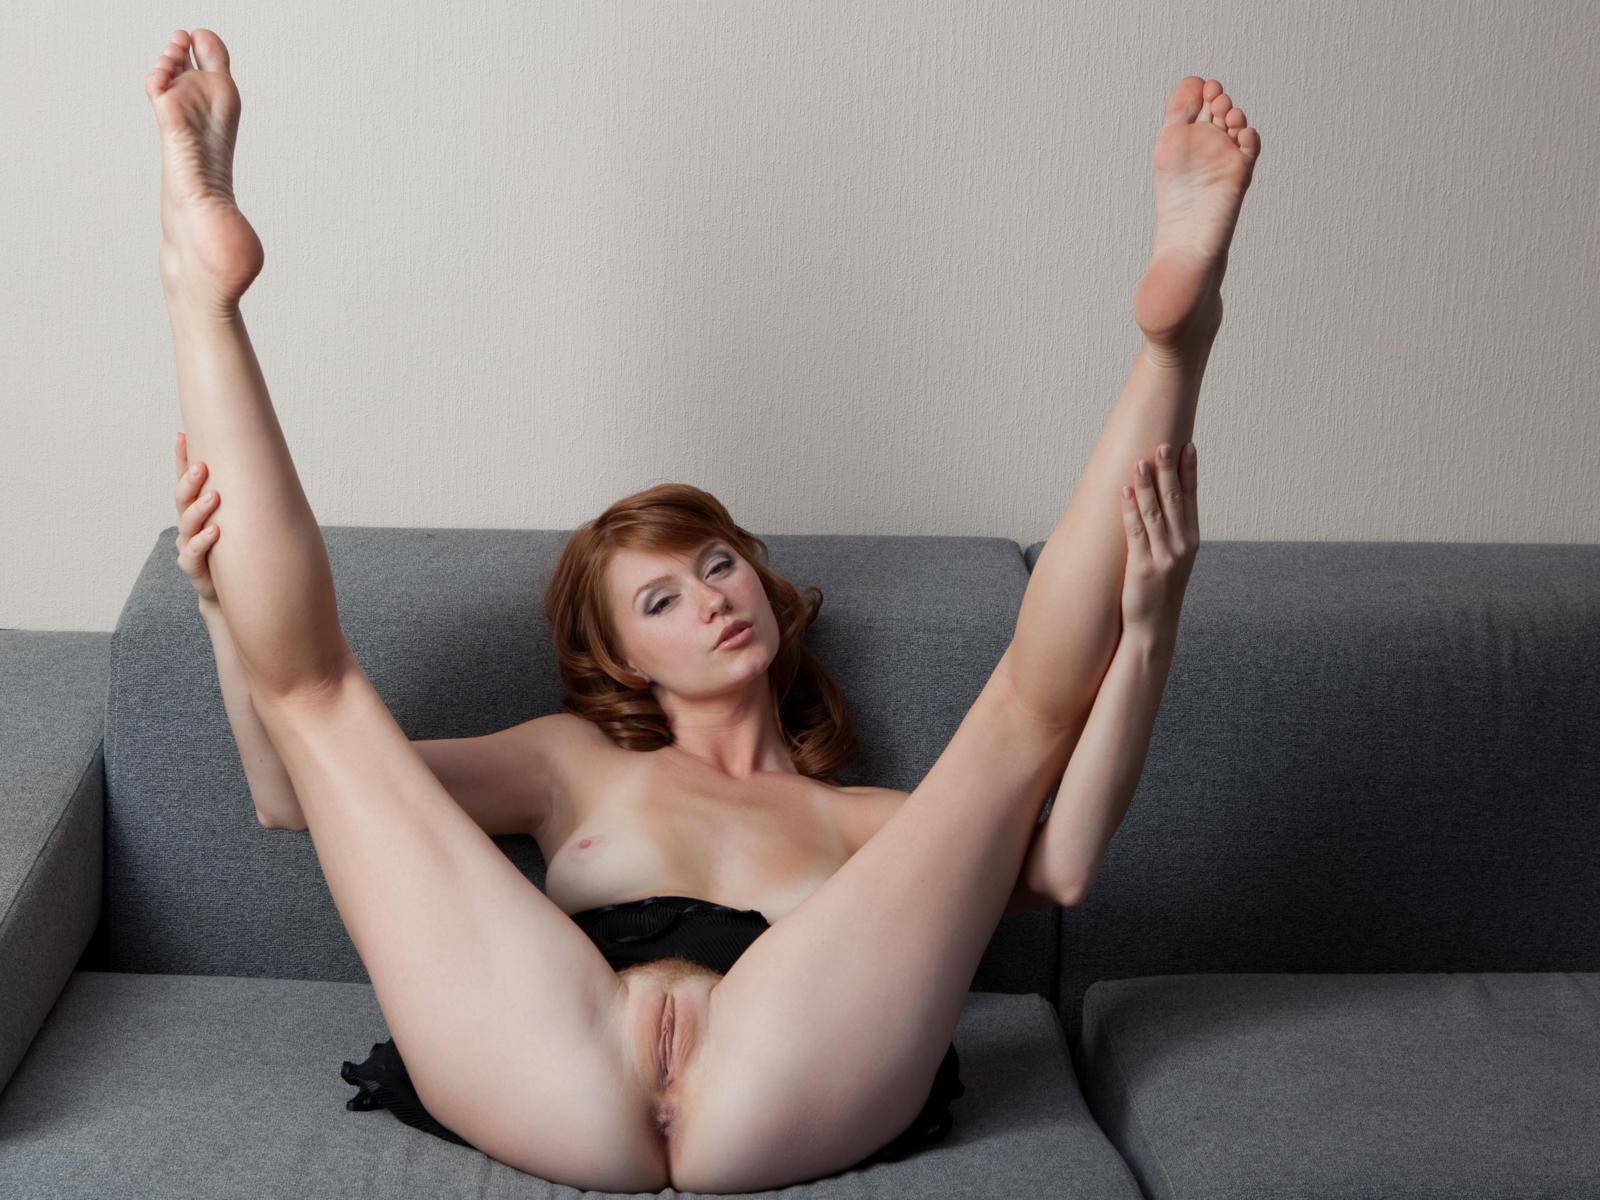 Girl foot fetish